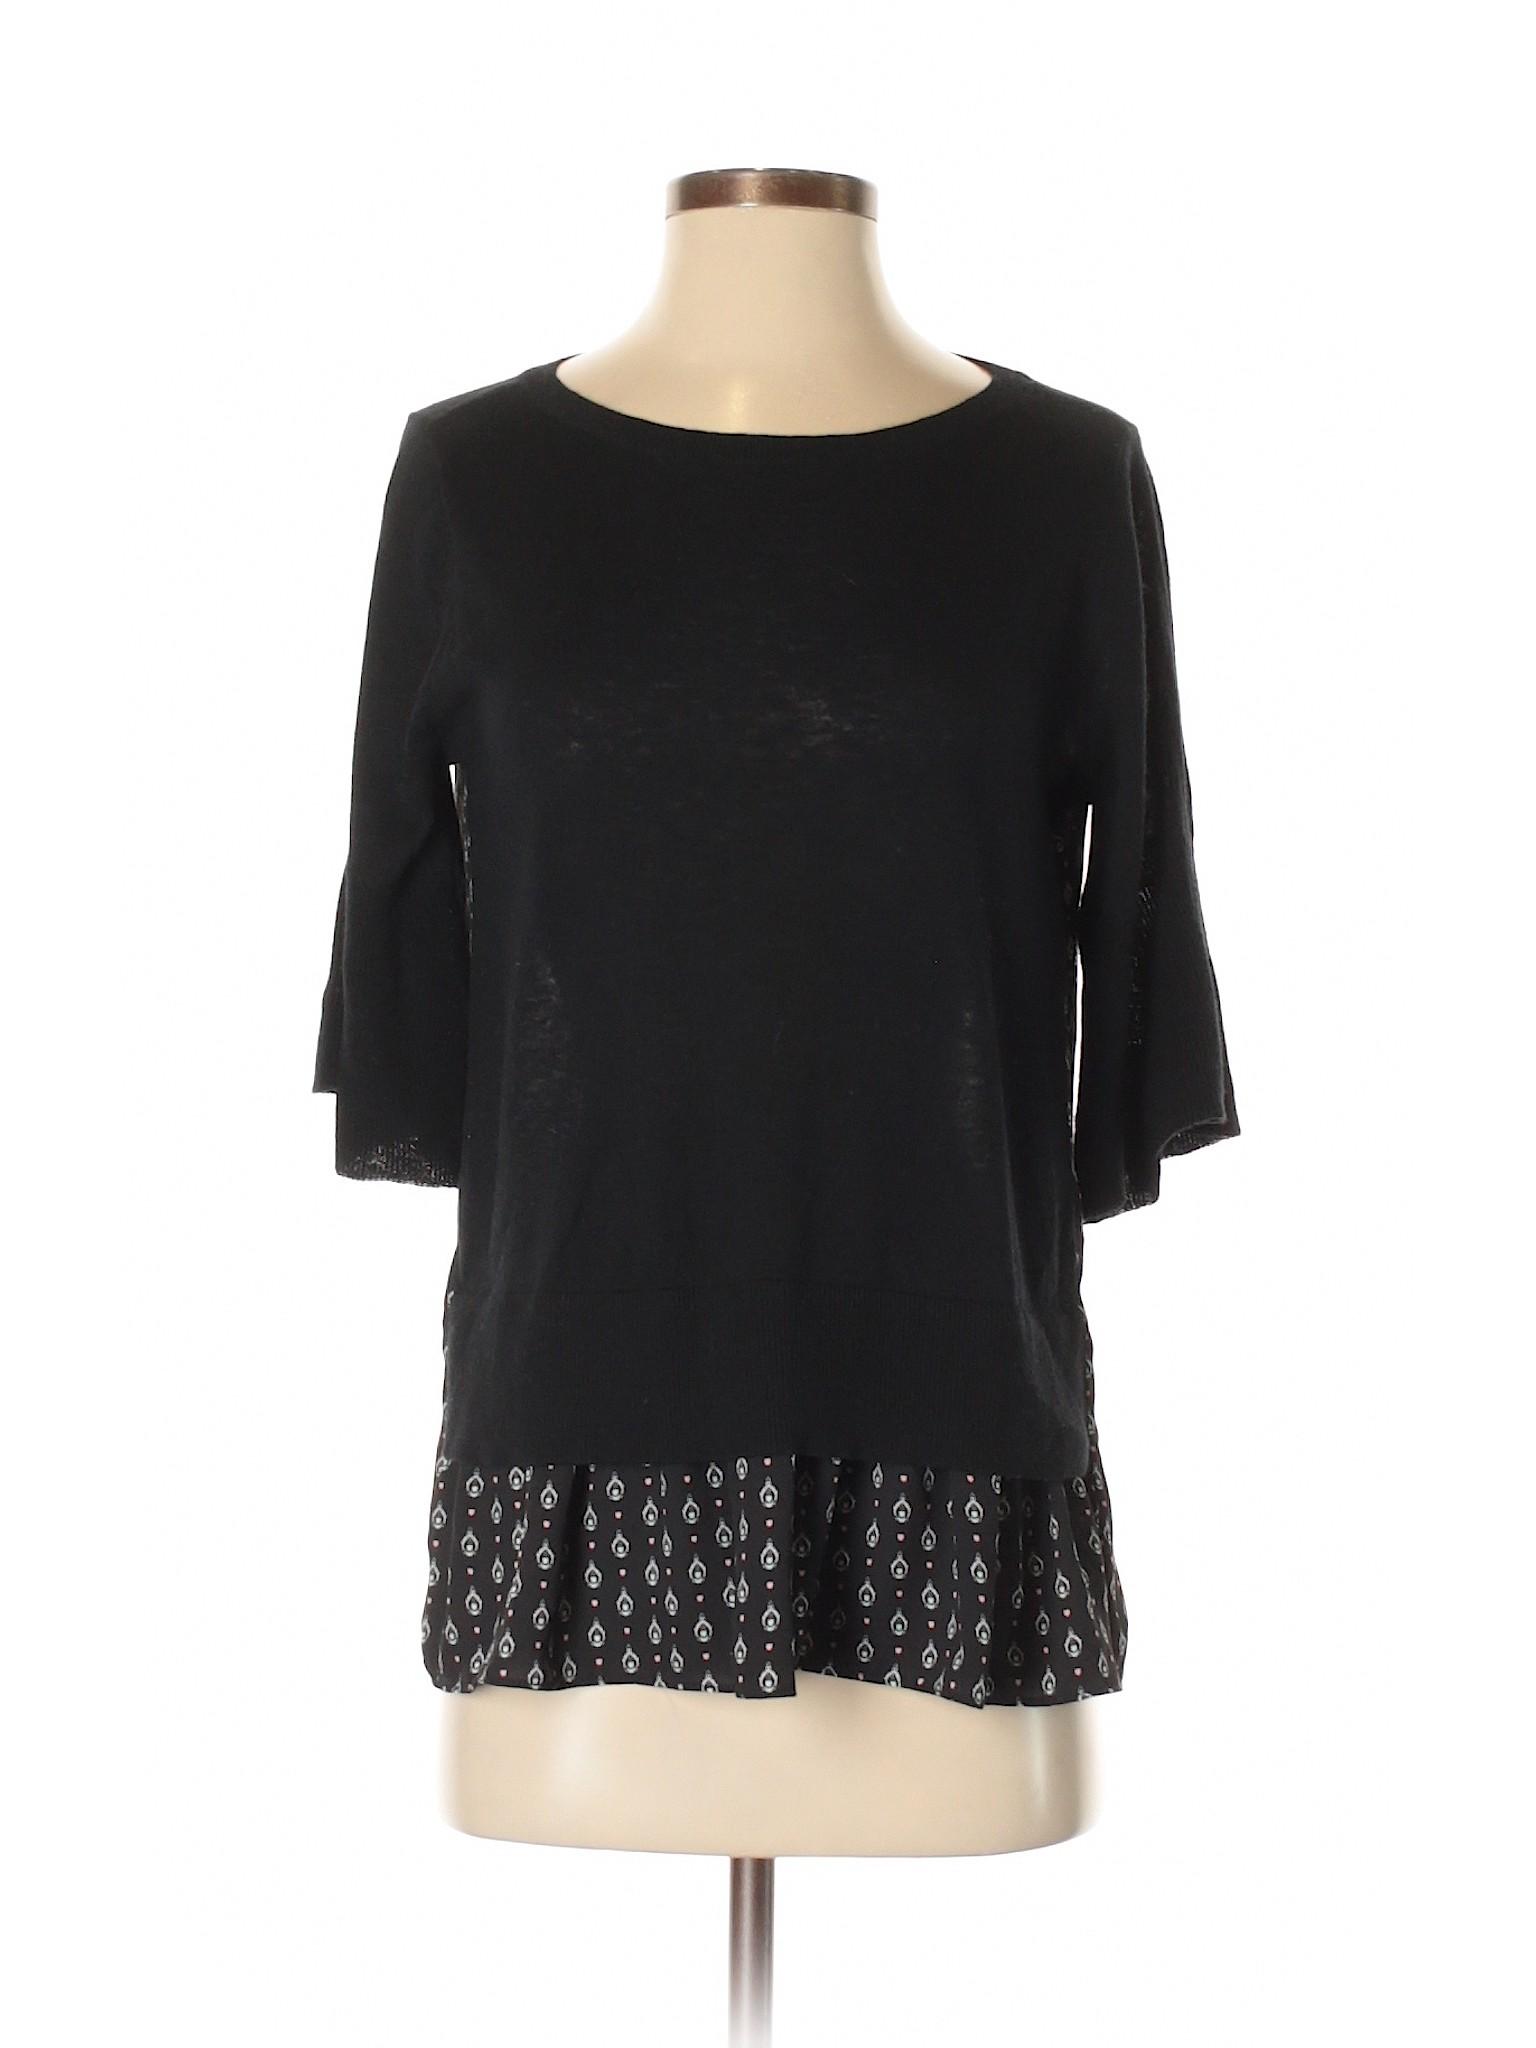 LOFT Ann Taylor winter Pullover Sweater Boutique 5tq6Rw4